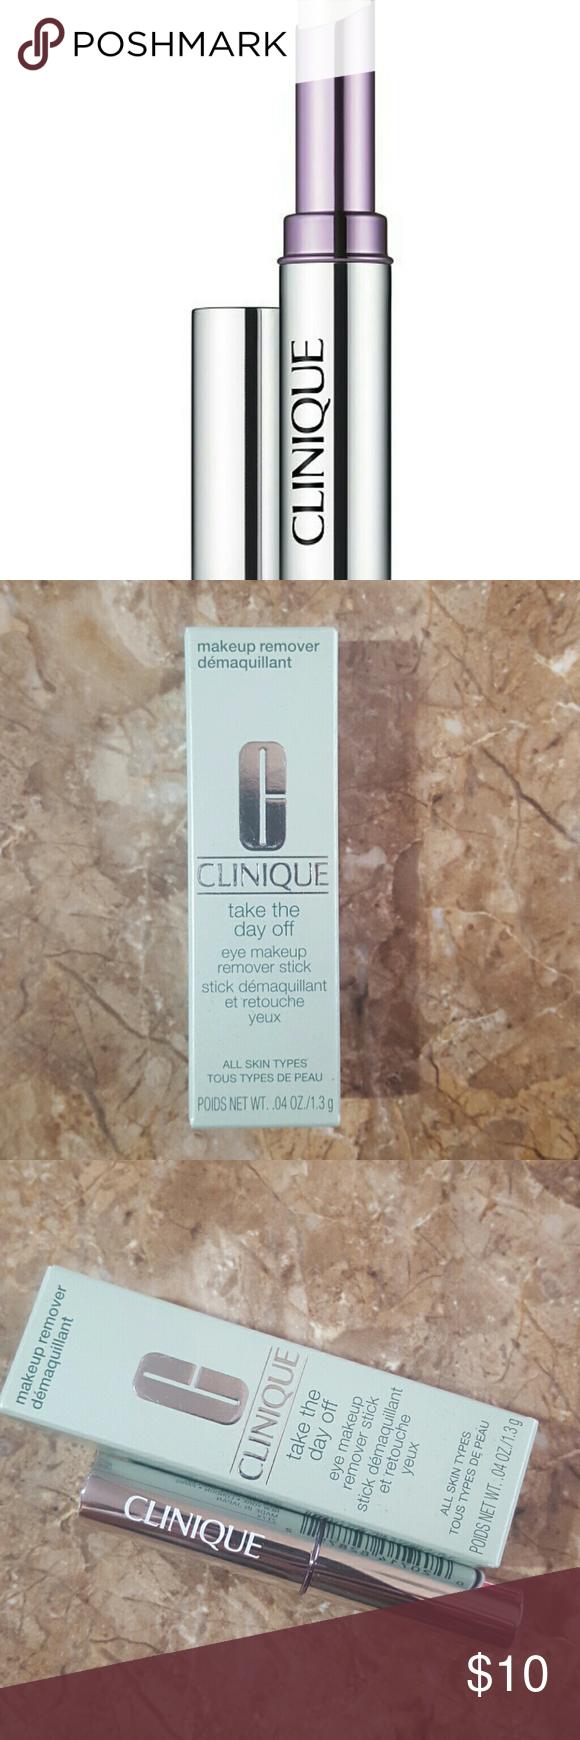 CLINIQUE Eye makeup remover stick NWT Eye makeup remover